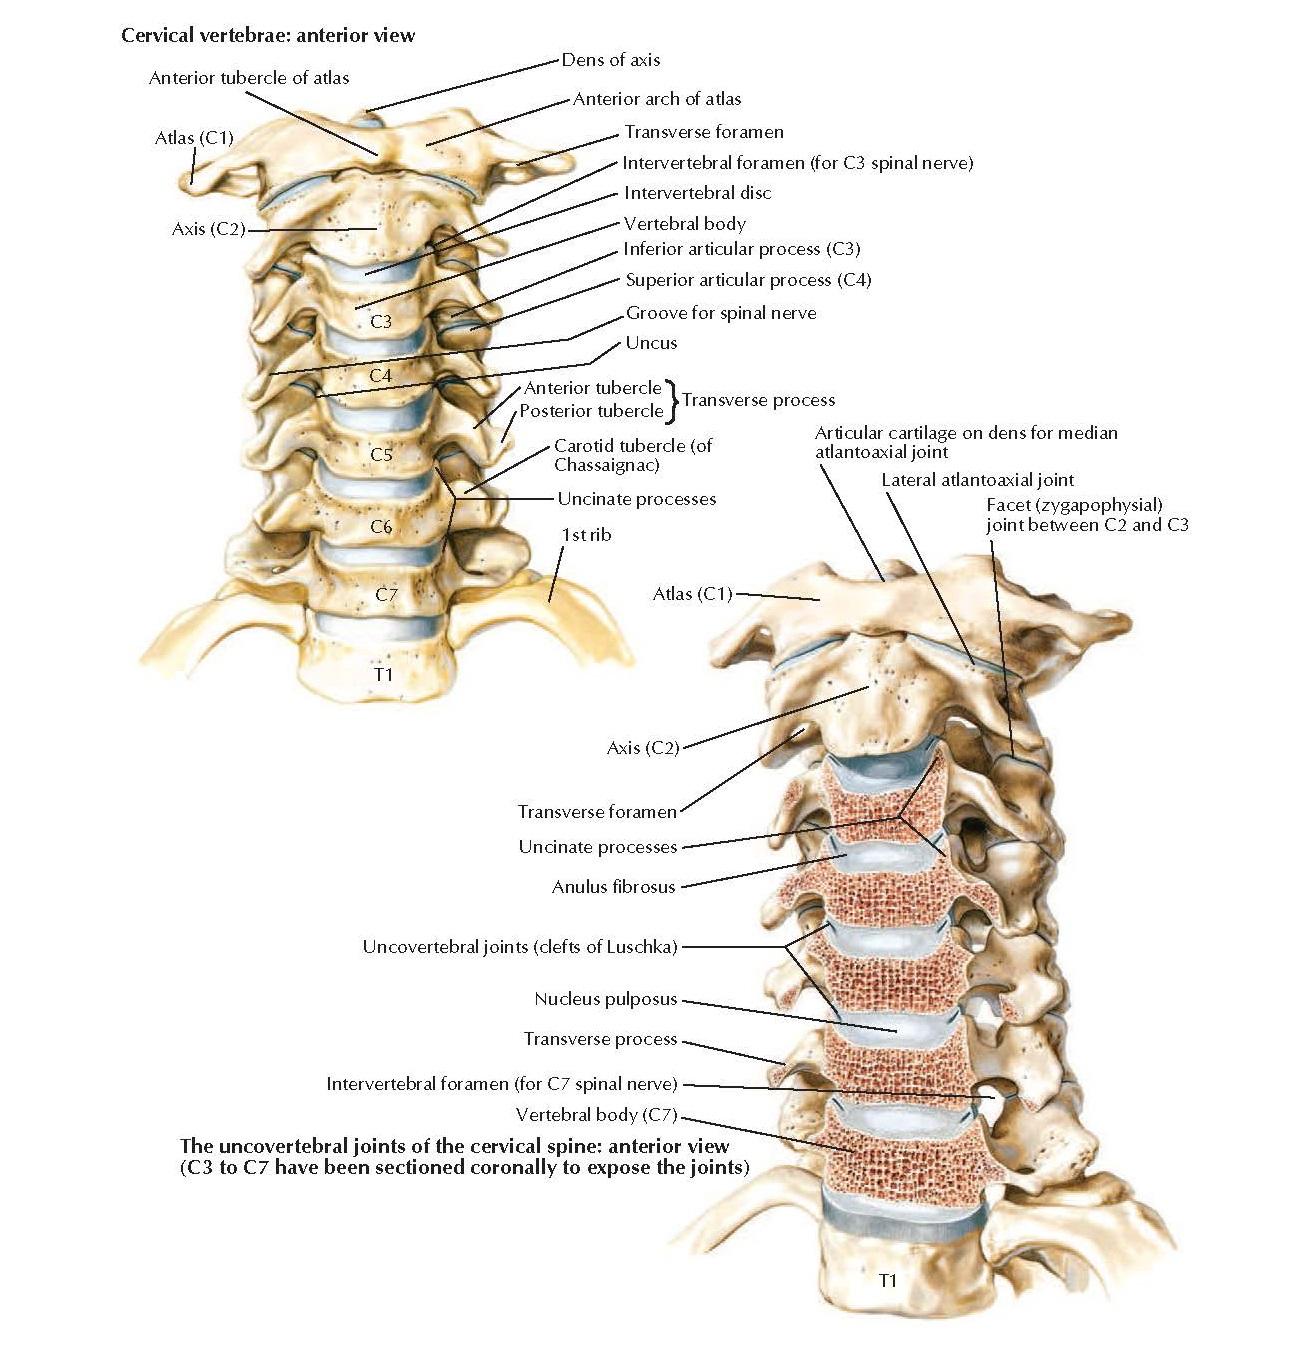 Cervical Vertebrae: Uncovertebral Joints Anatomy